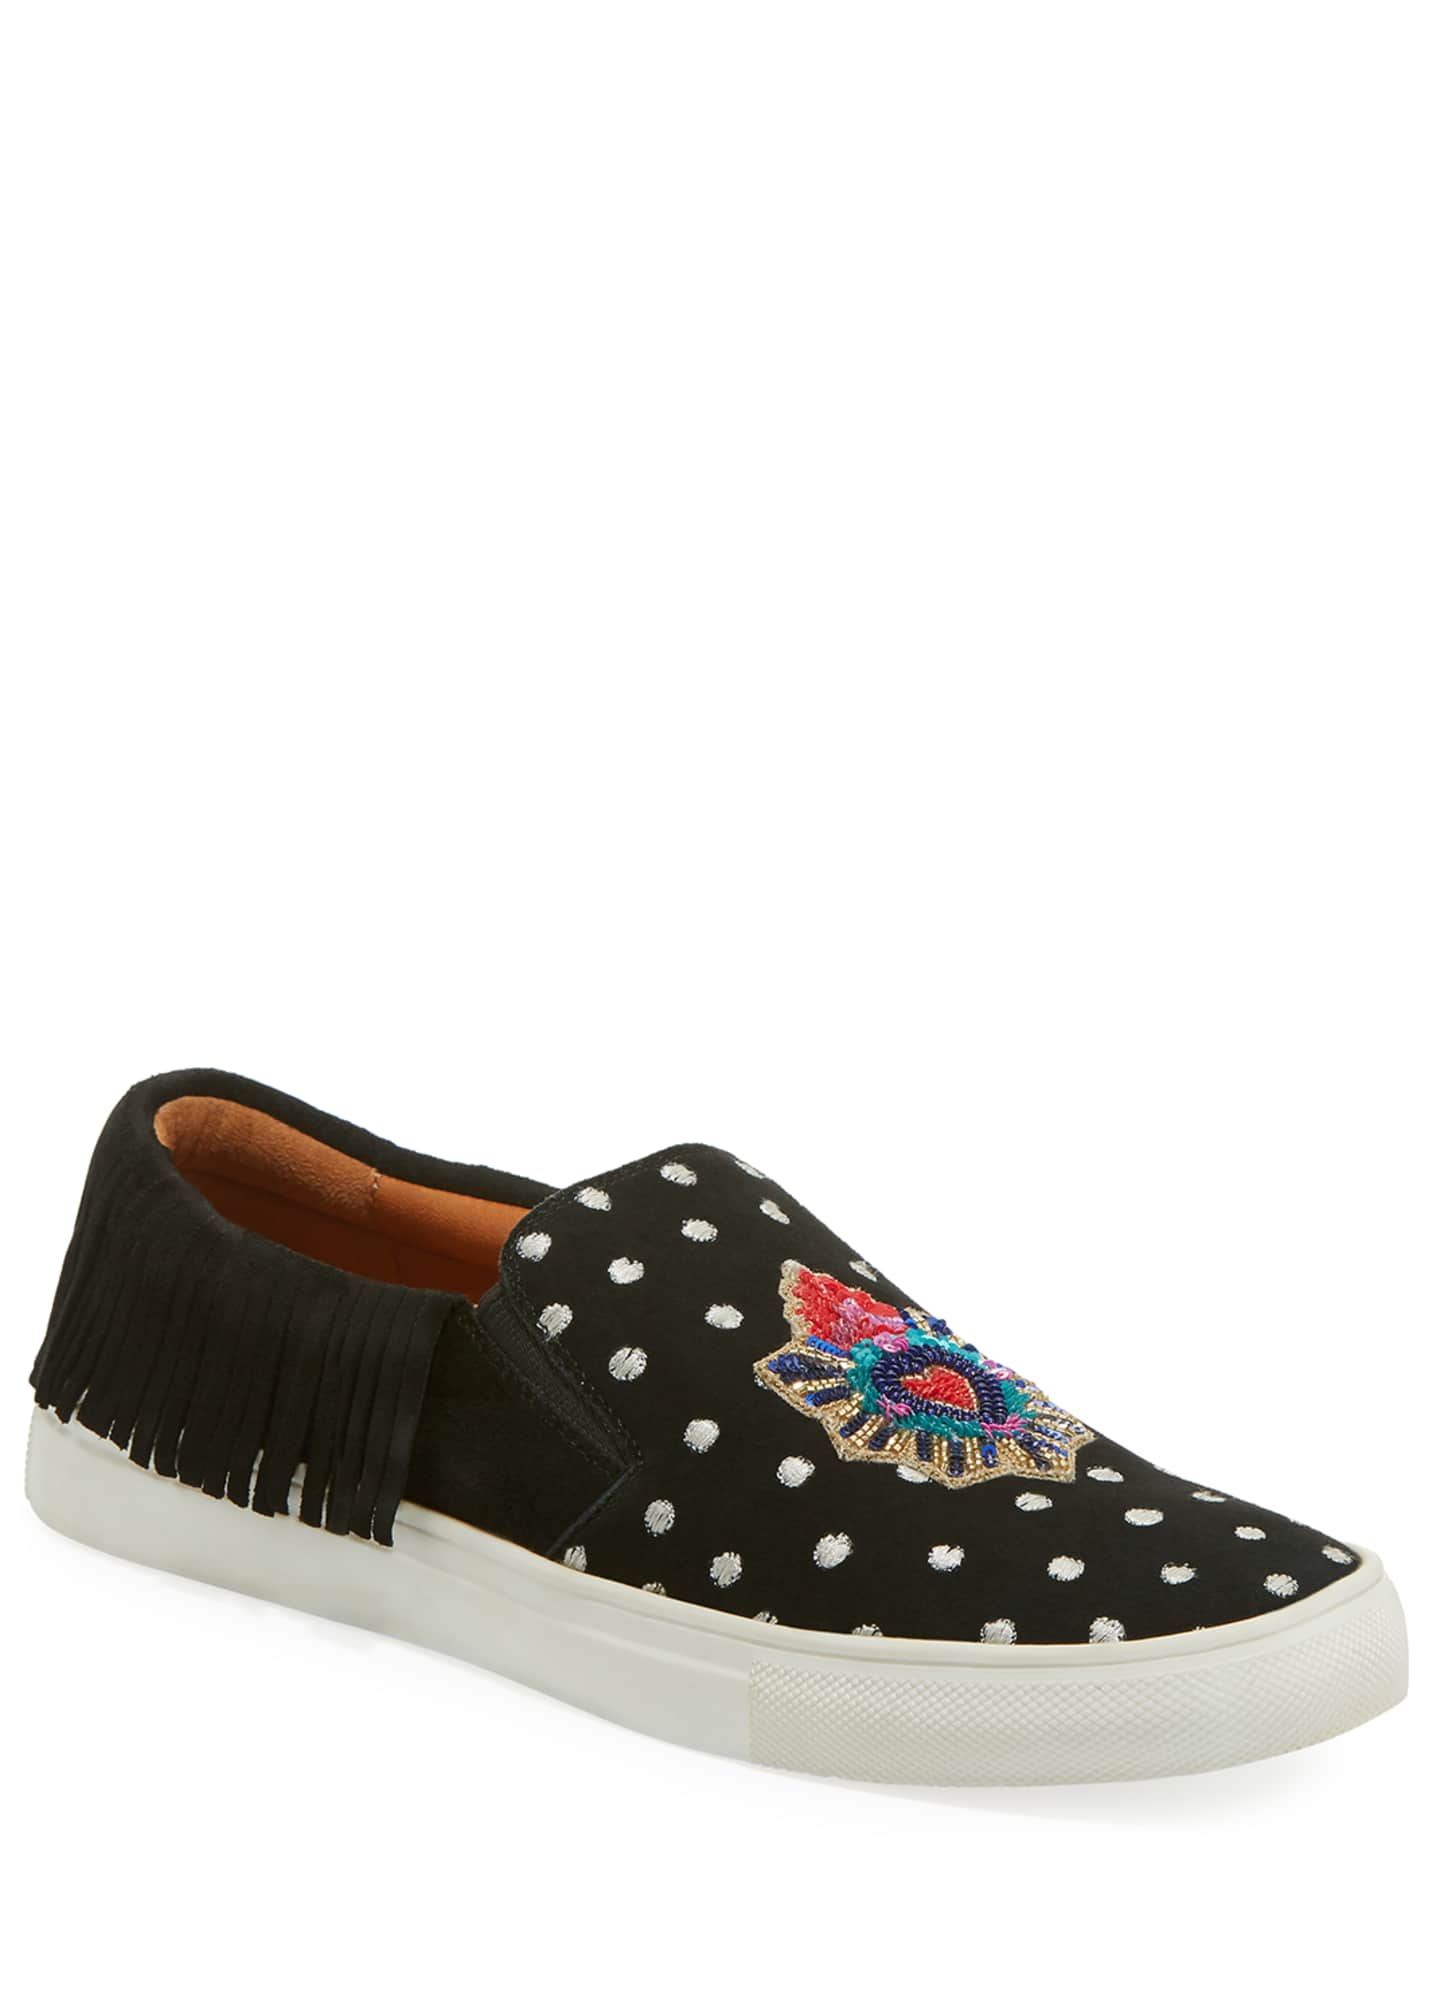 Figue Corazon Karita Slip-On Sneakers